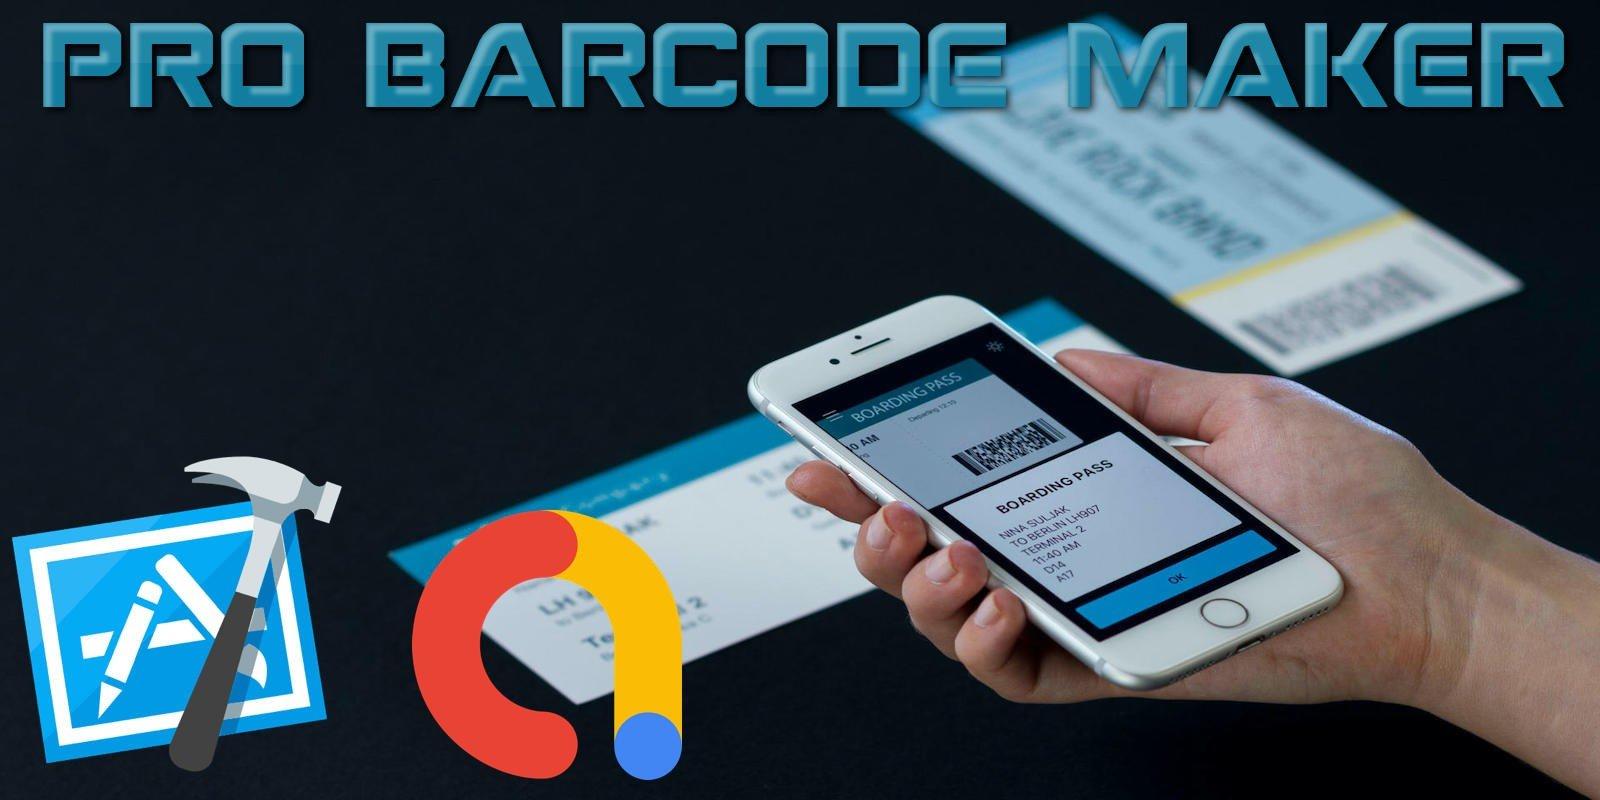 Pro Barcode Maker - iOS App Source Code